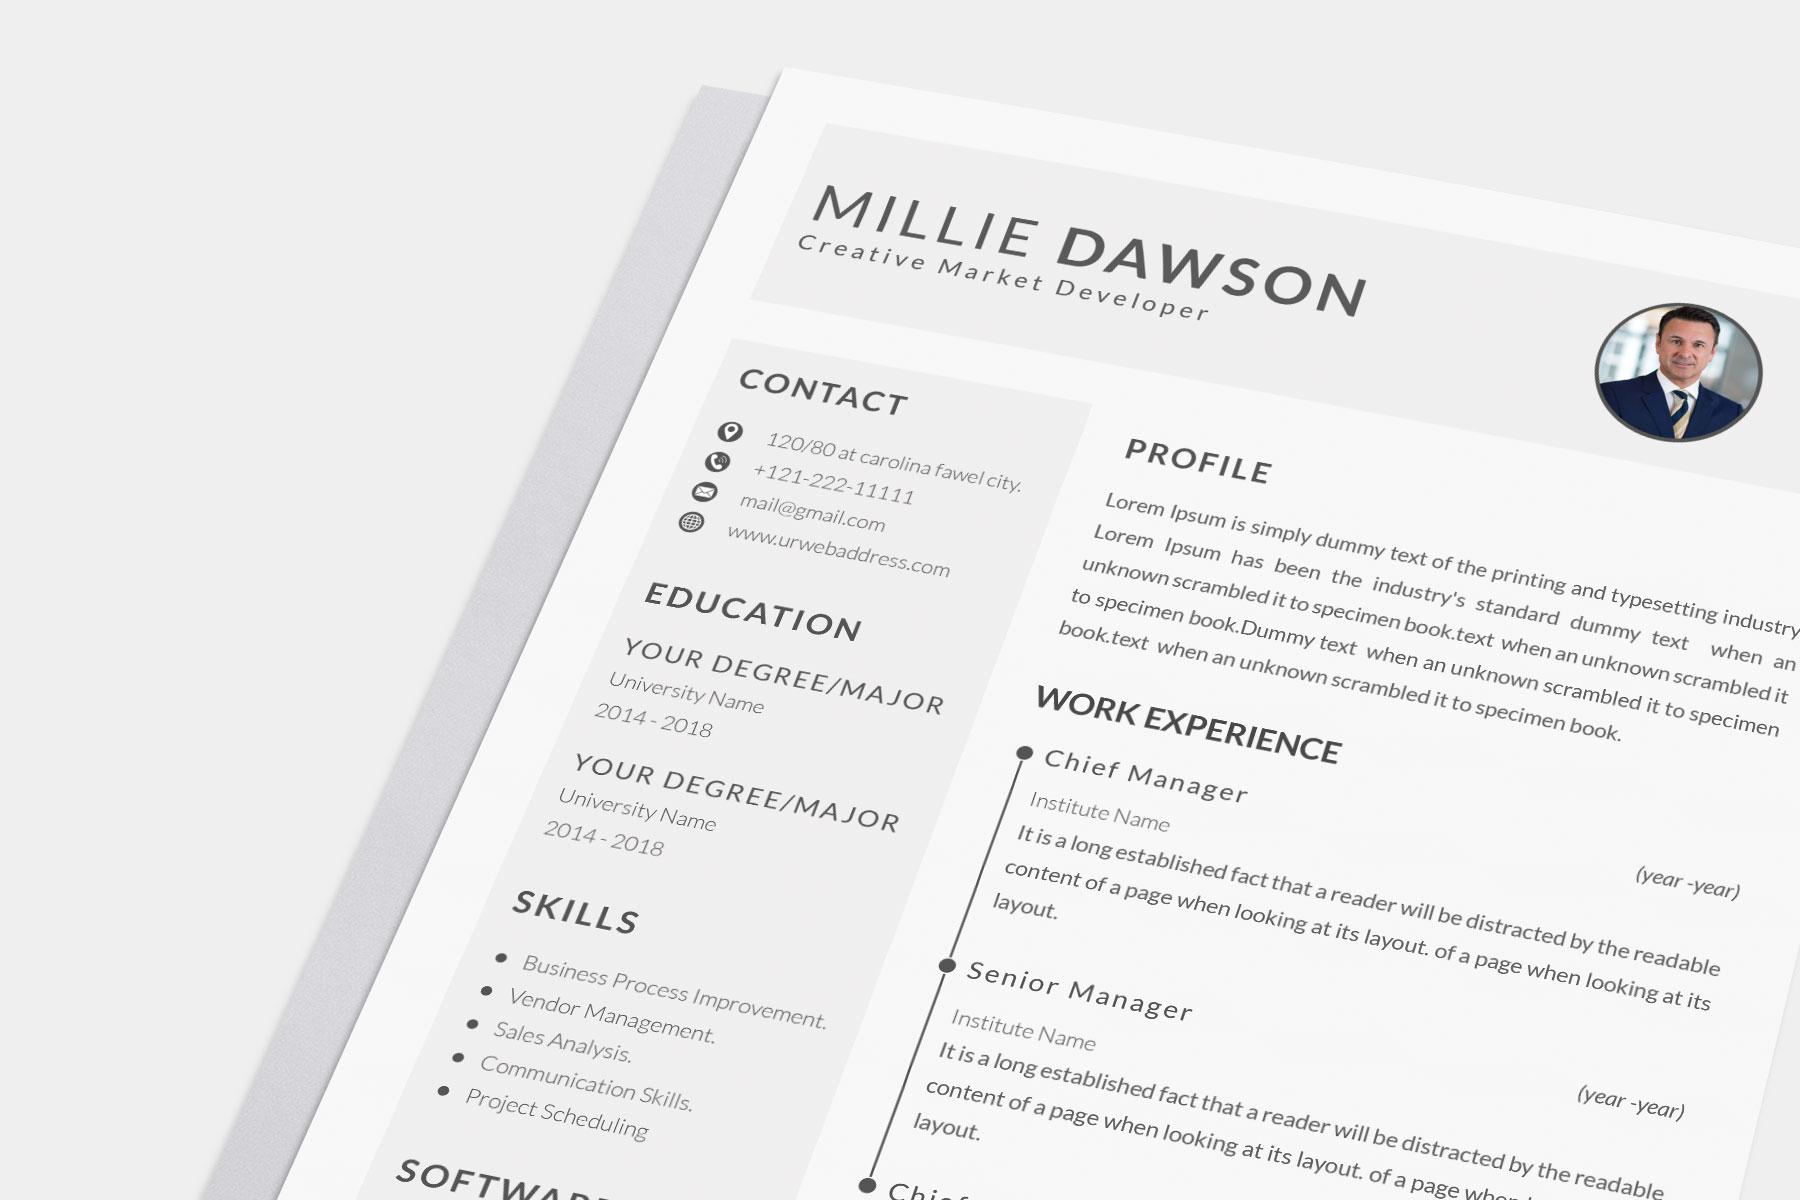 Professional Cv Resume Bonus business card Word/PSD,AI example image 4